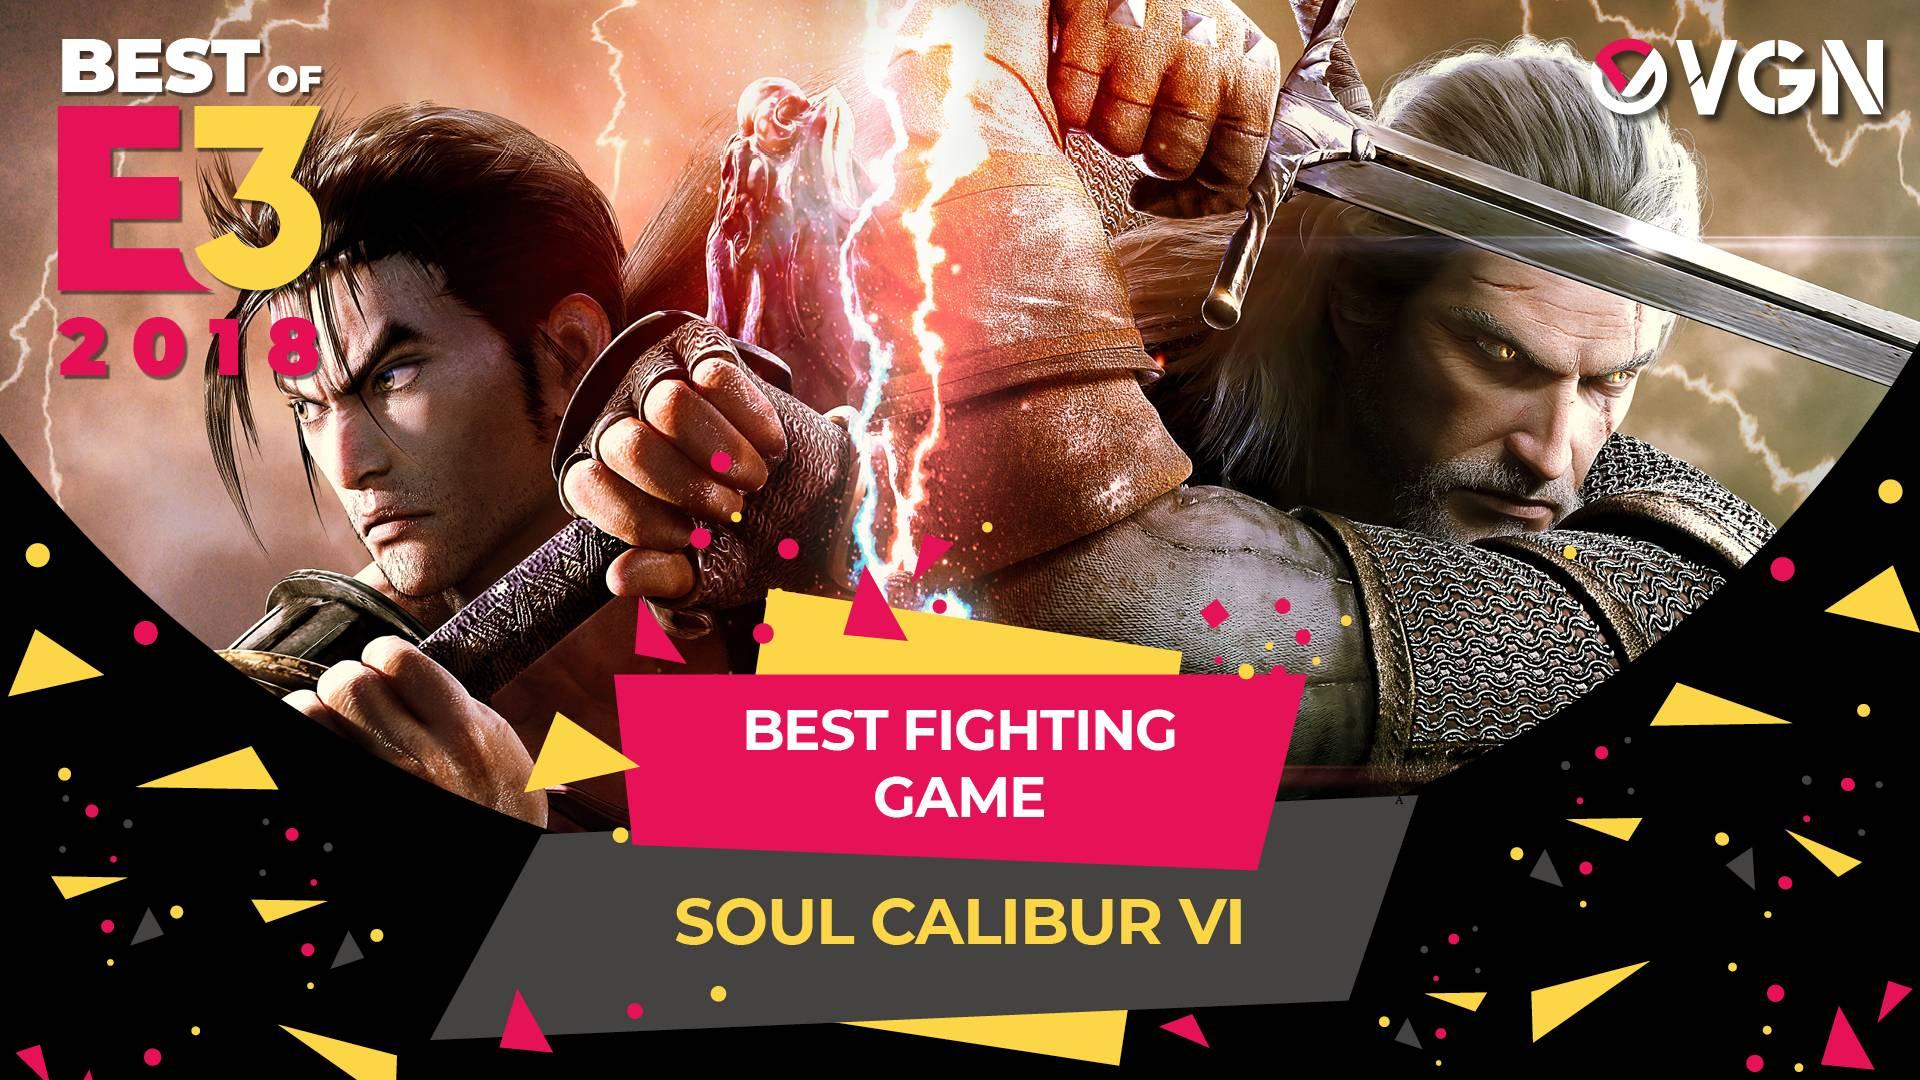 E3 2018 - Best Fighting Game - Soul Calibur VI